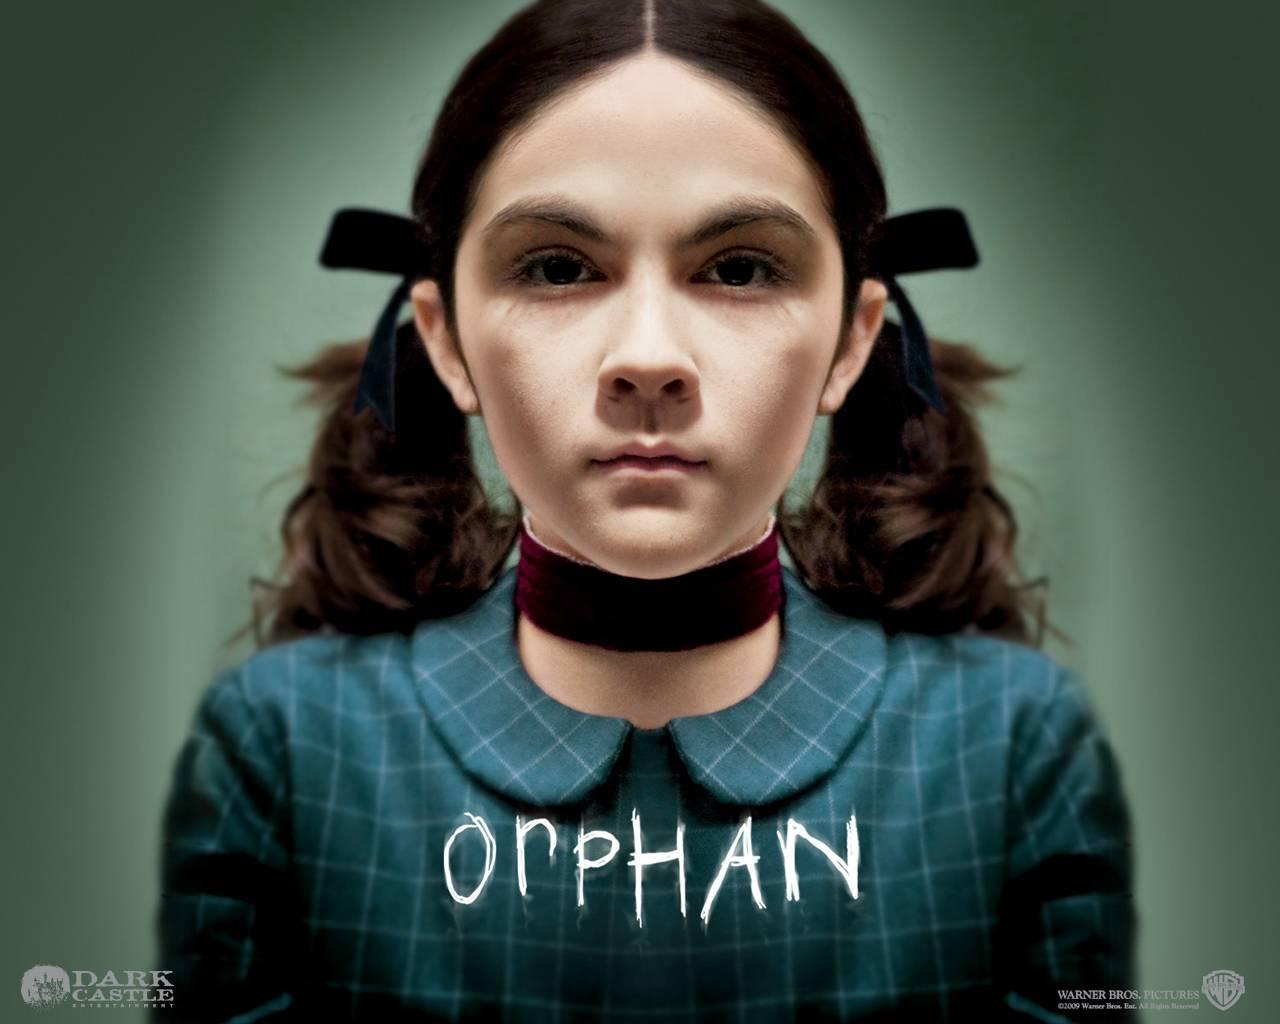 2009_orphan_wallpaper_002